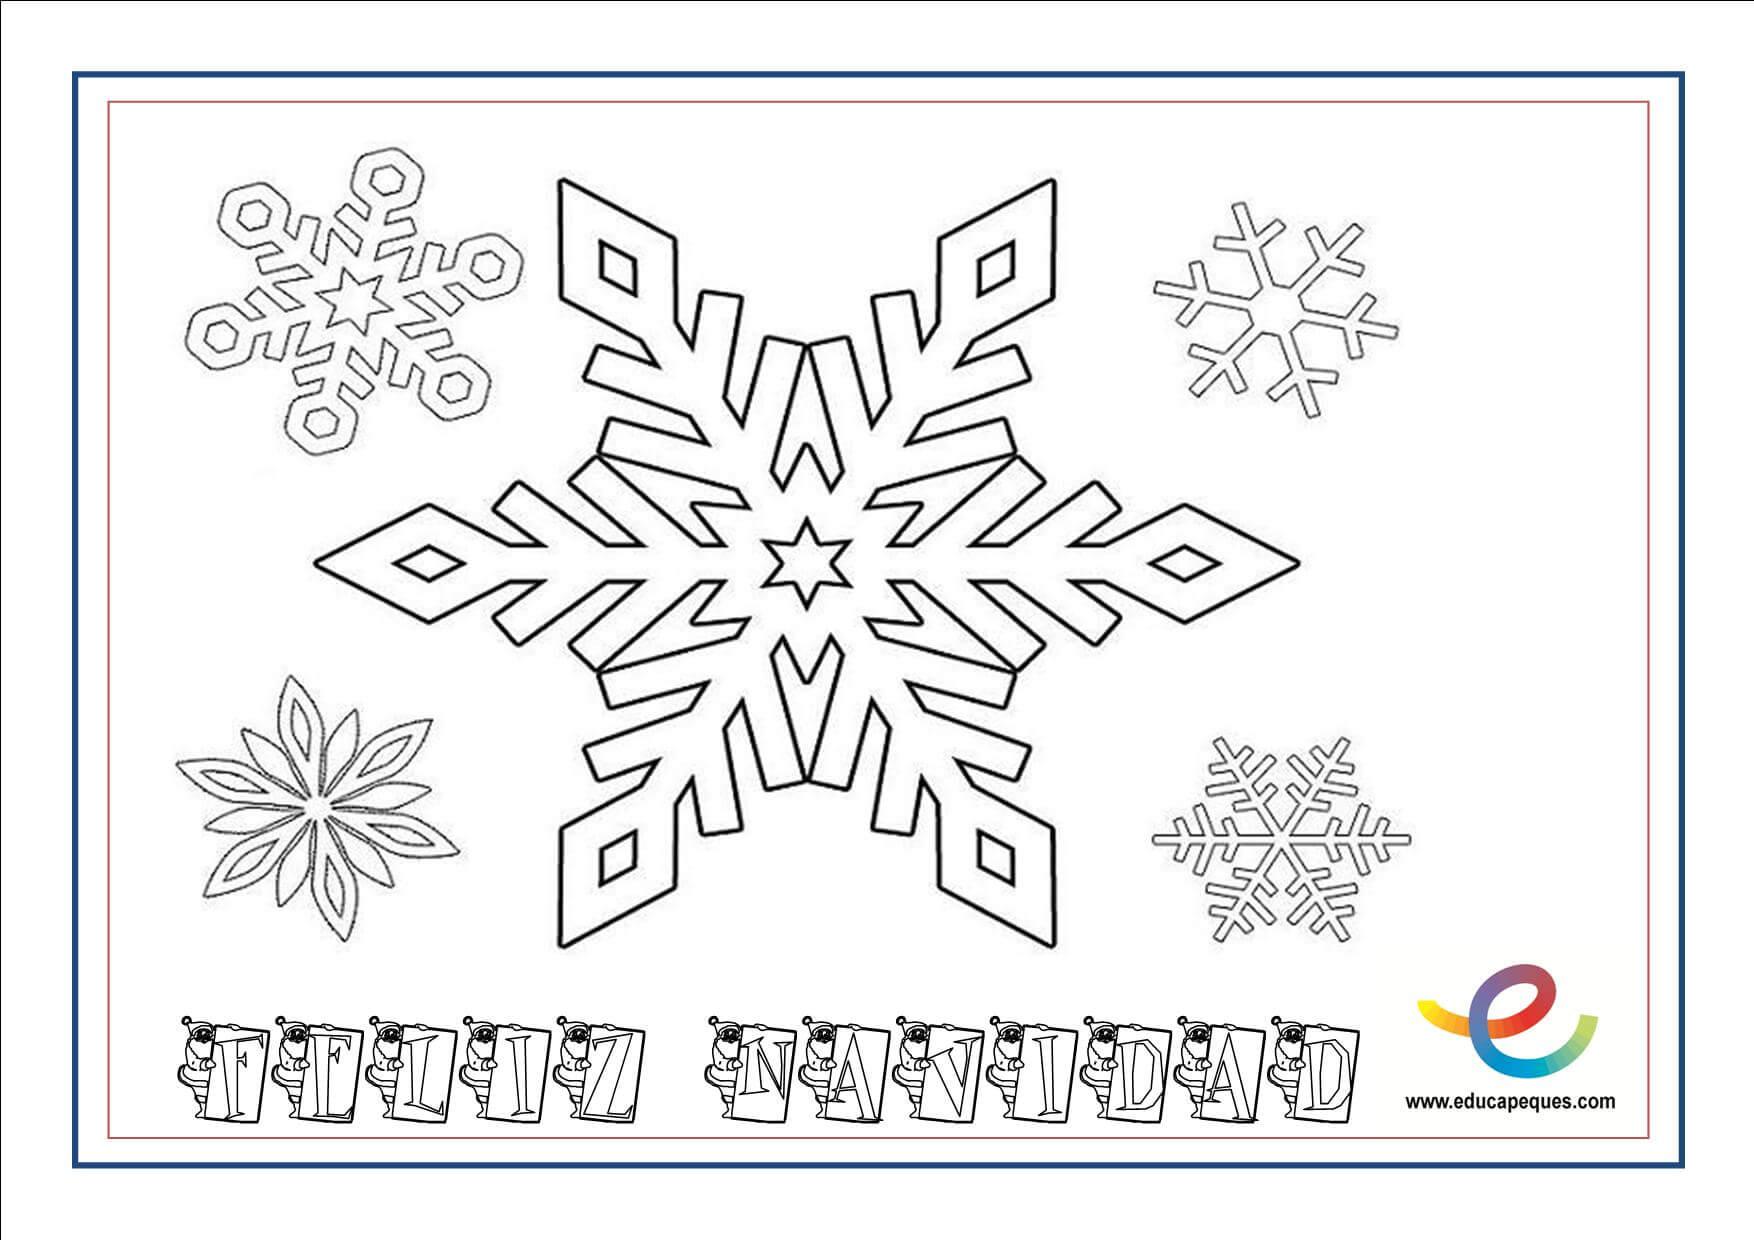 Mejor De Dibujos De Copos De Nieve Para Colorear E Imprimir